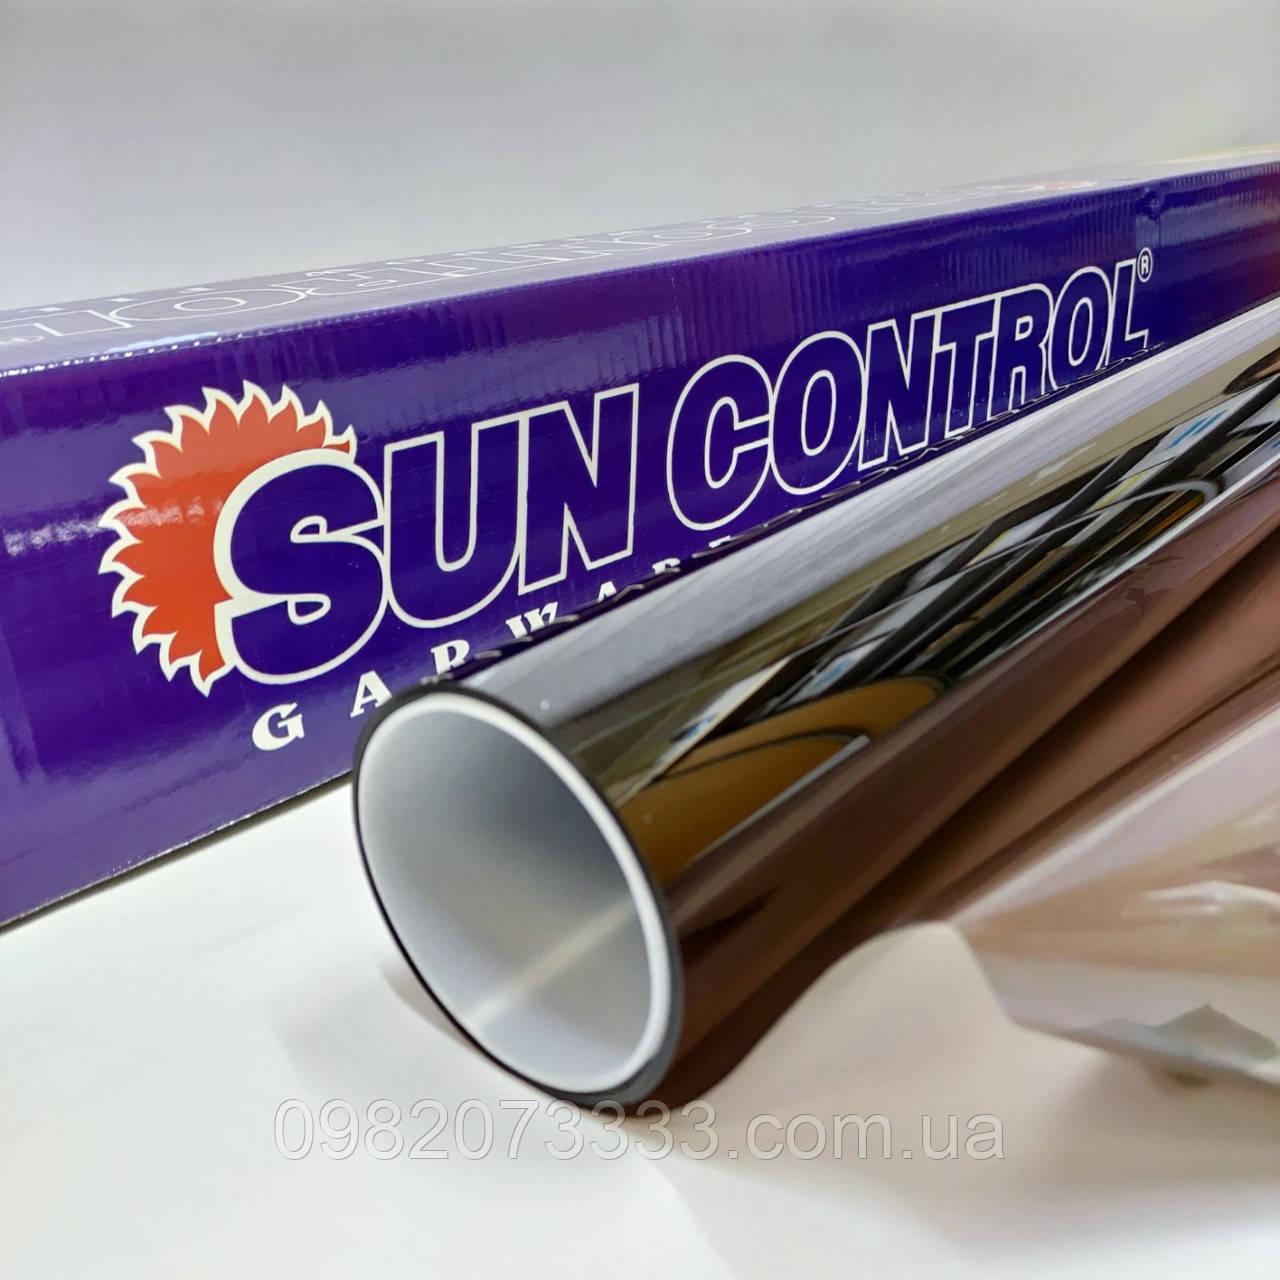 Пленка NR Bronze35 Sun Control для тонировки стекол, витрин, стеклянных перегородок ширина1,524 (цена за кв.м)